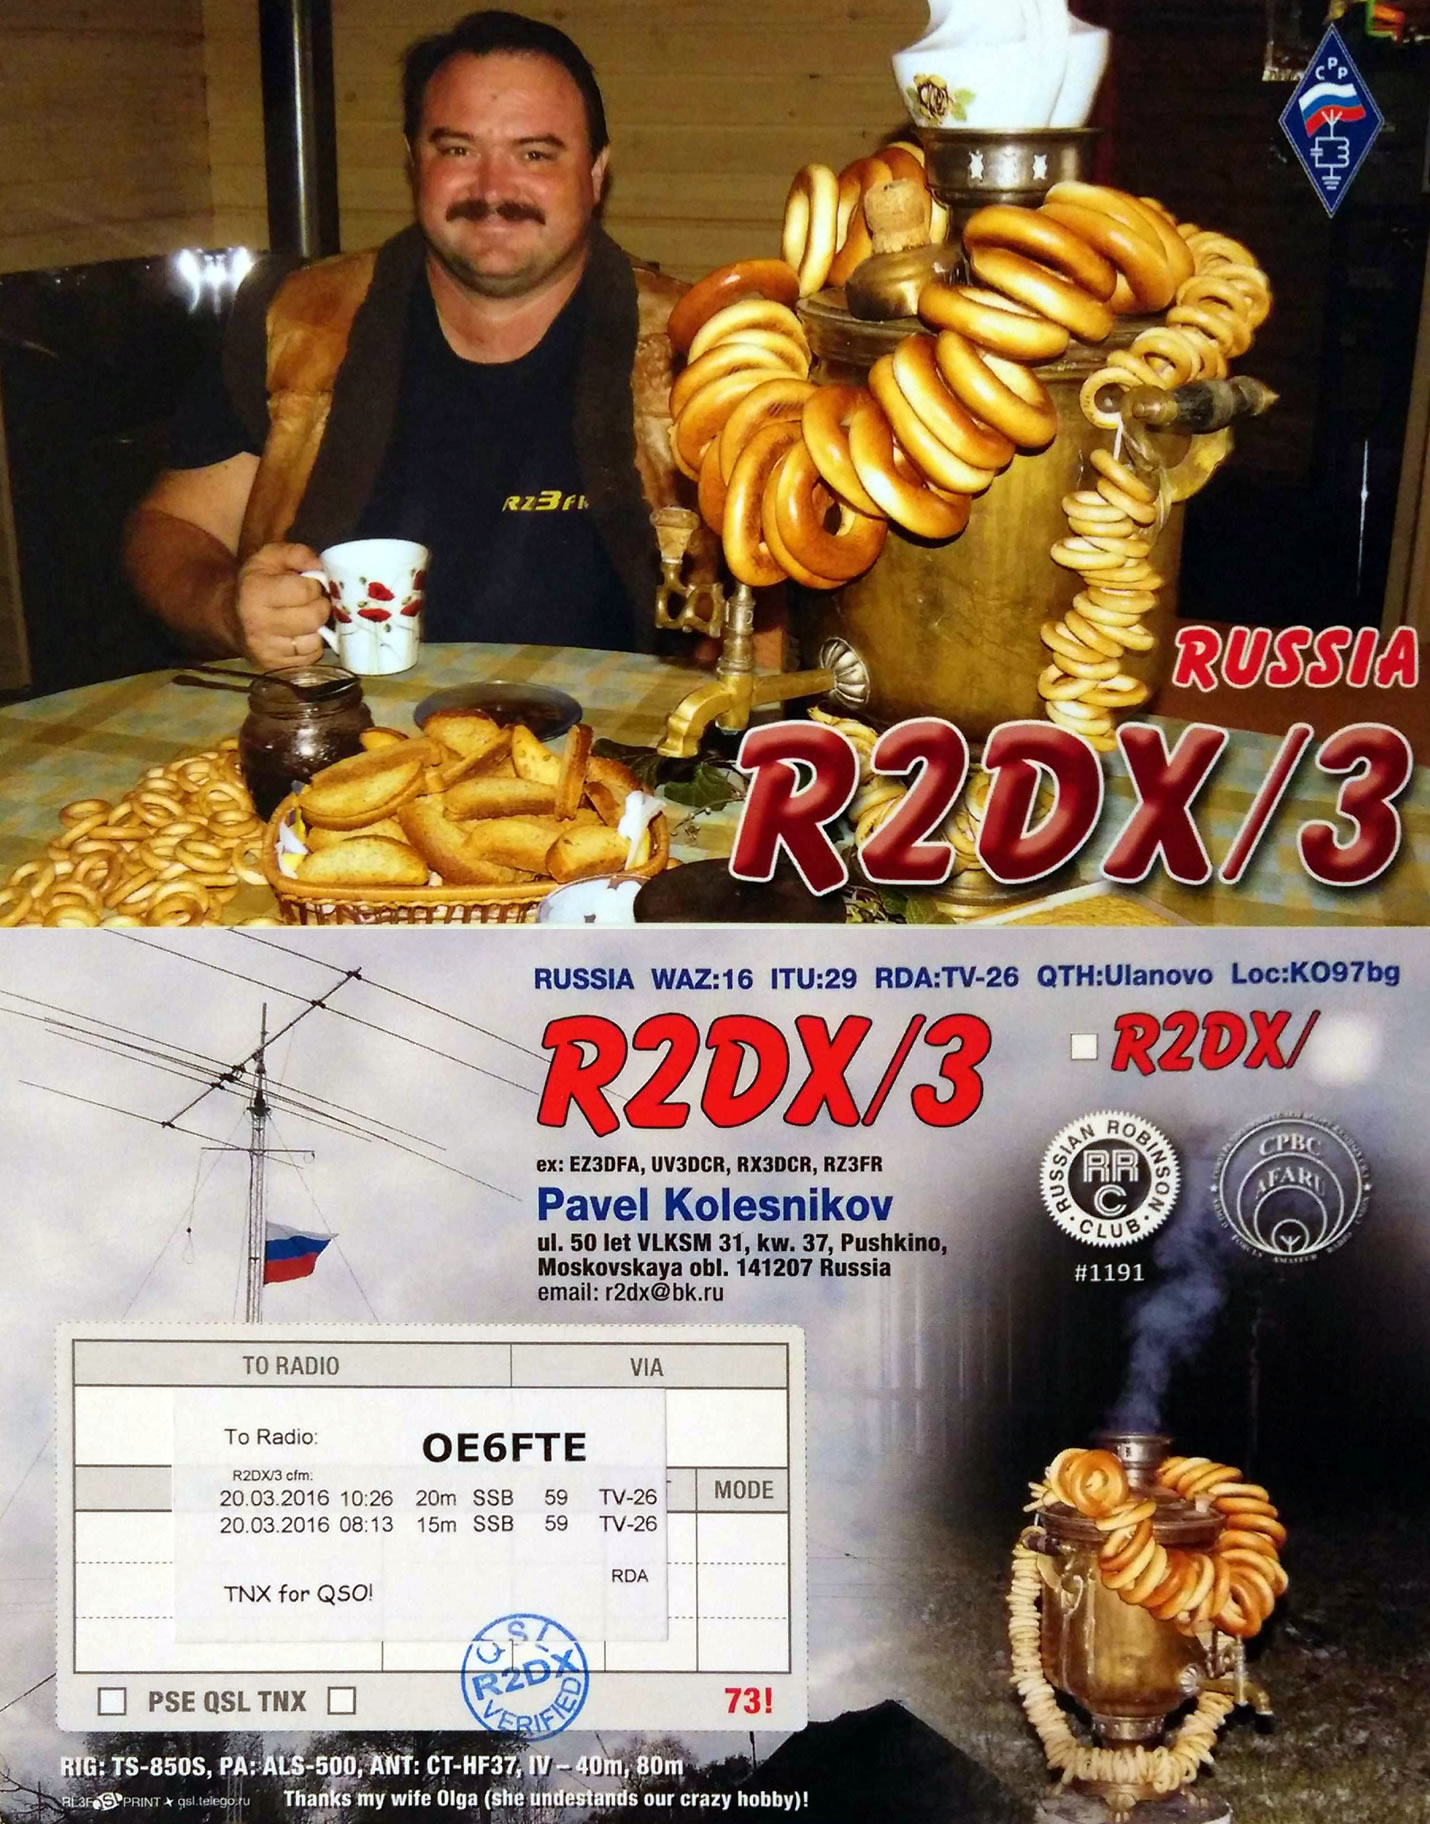 R2DX/3